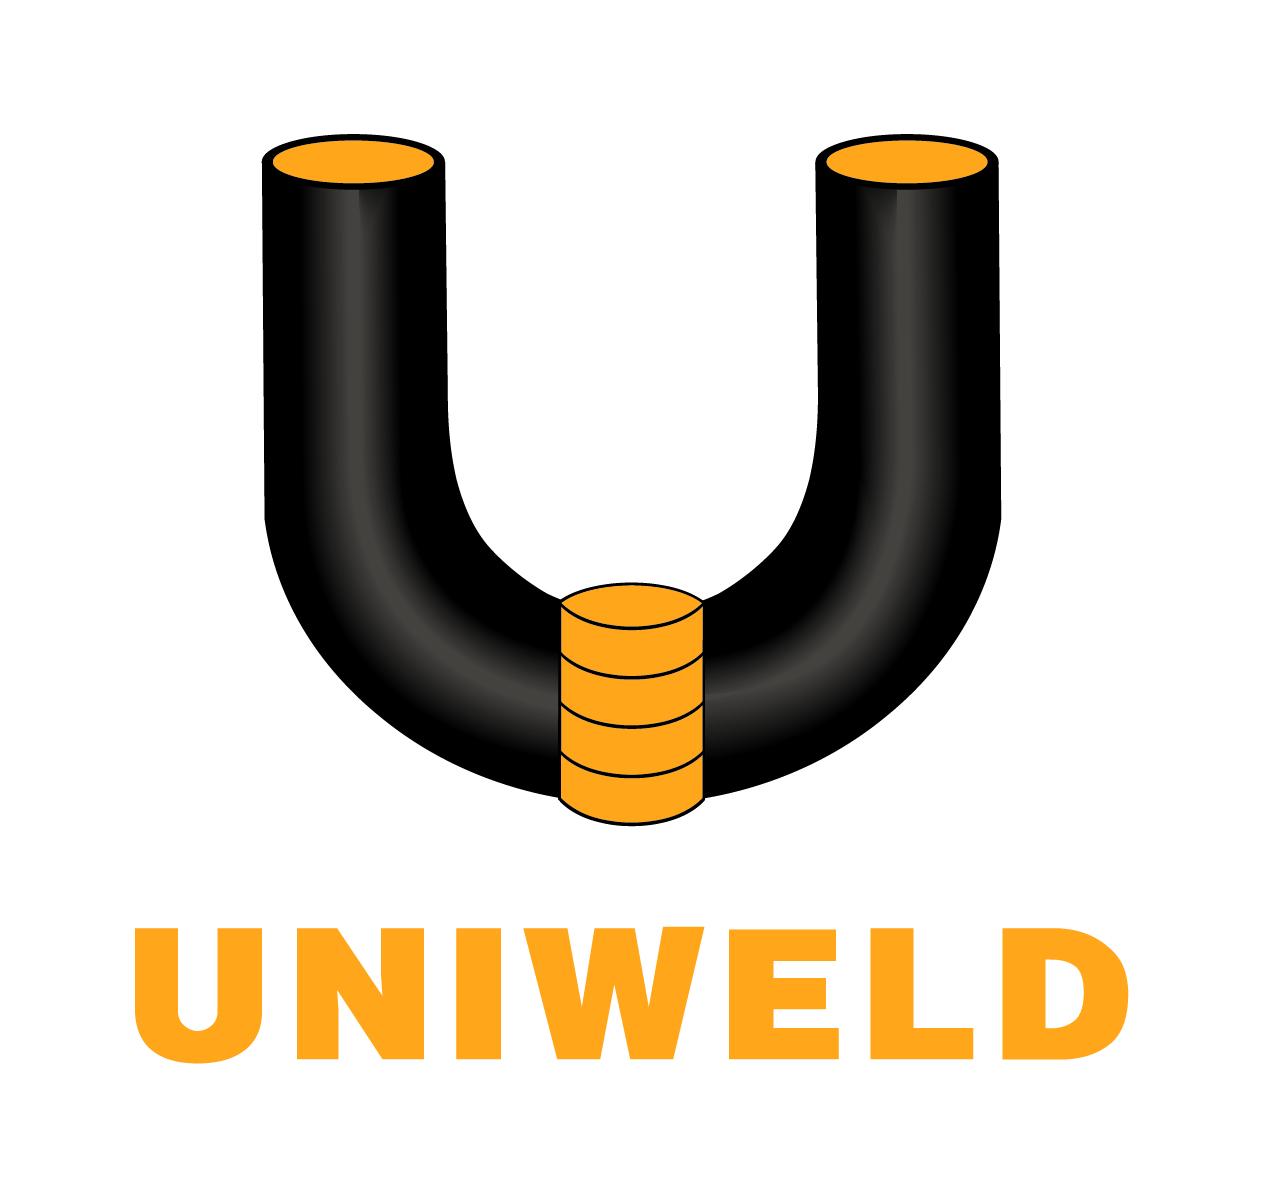 UNIWELD PRODUCTS (U.S.A.) PTE. LTD.